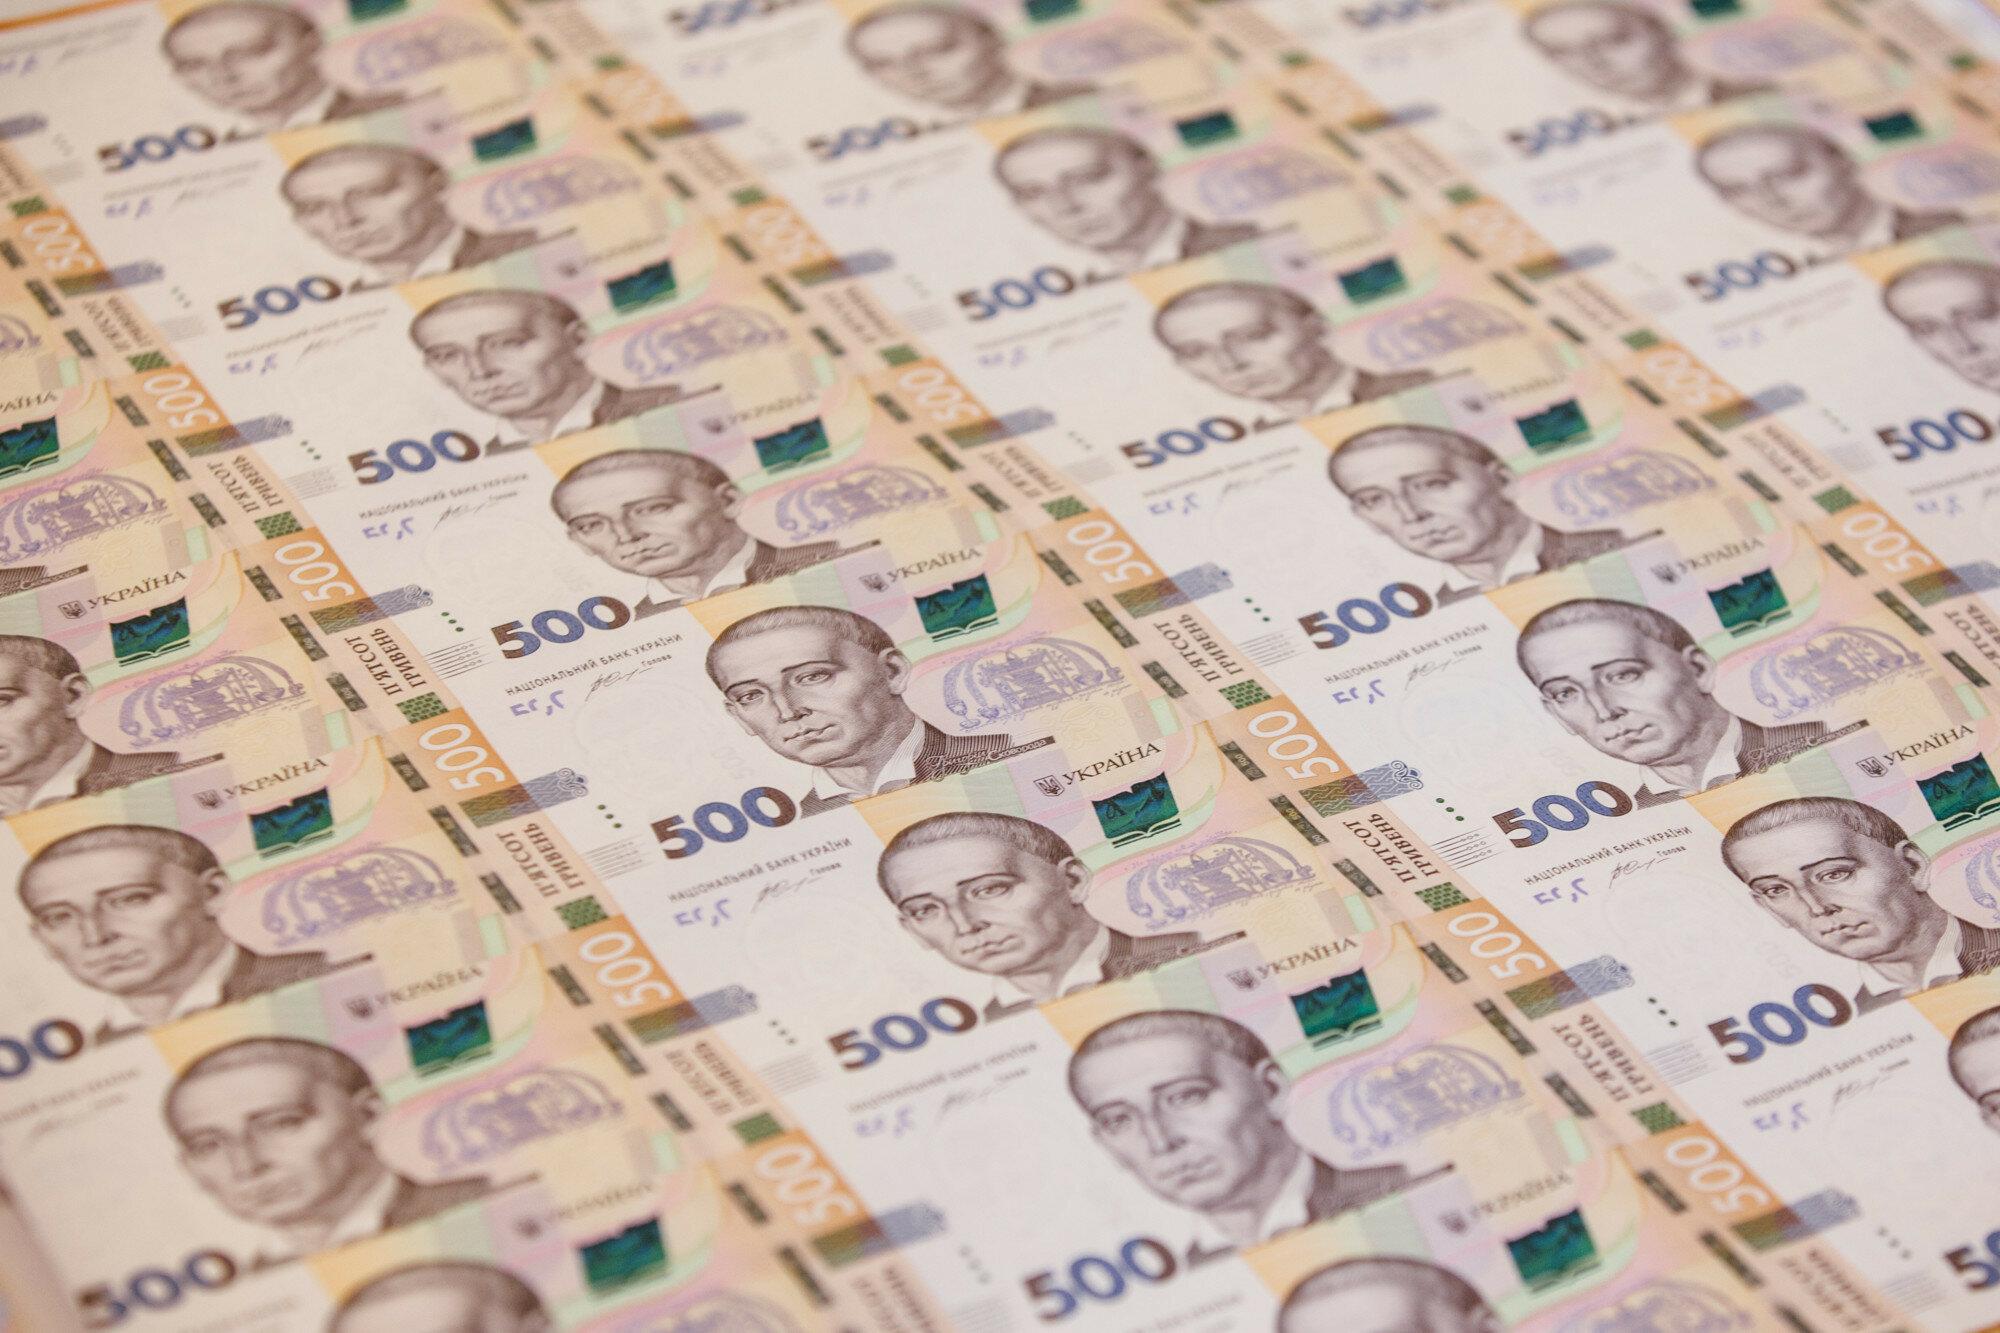 Вишняковский спиртзавод продали вдвое дешевле на повторном аукционе